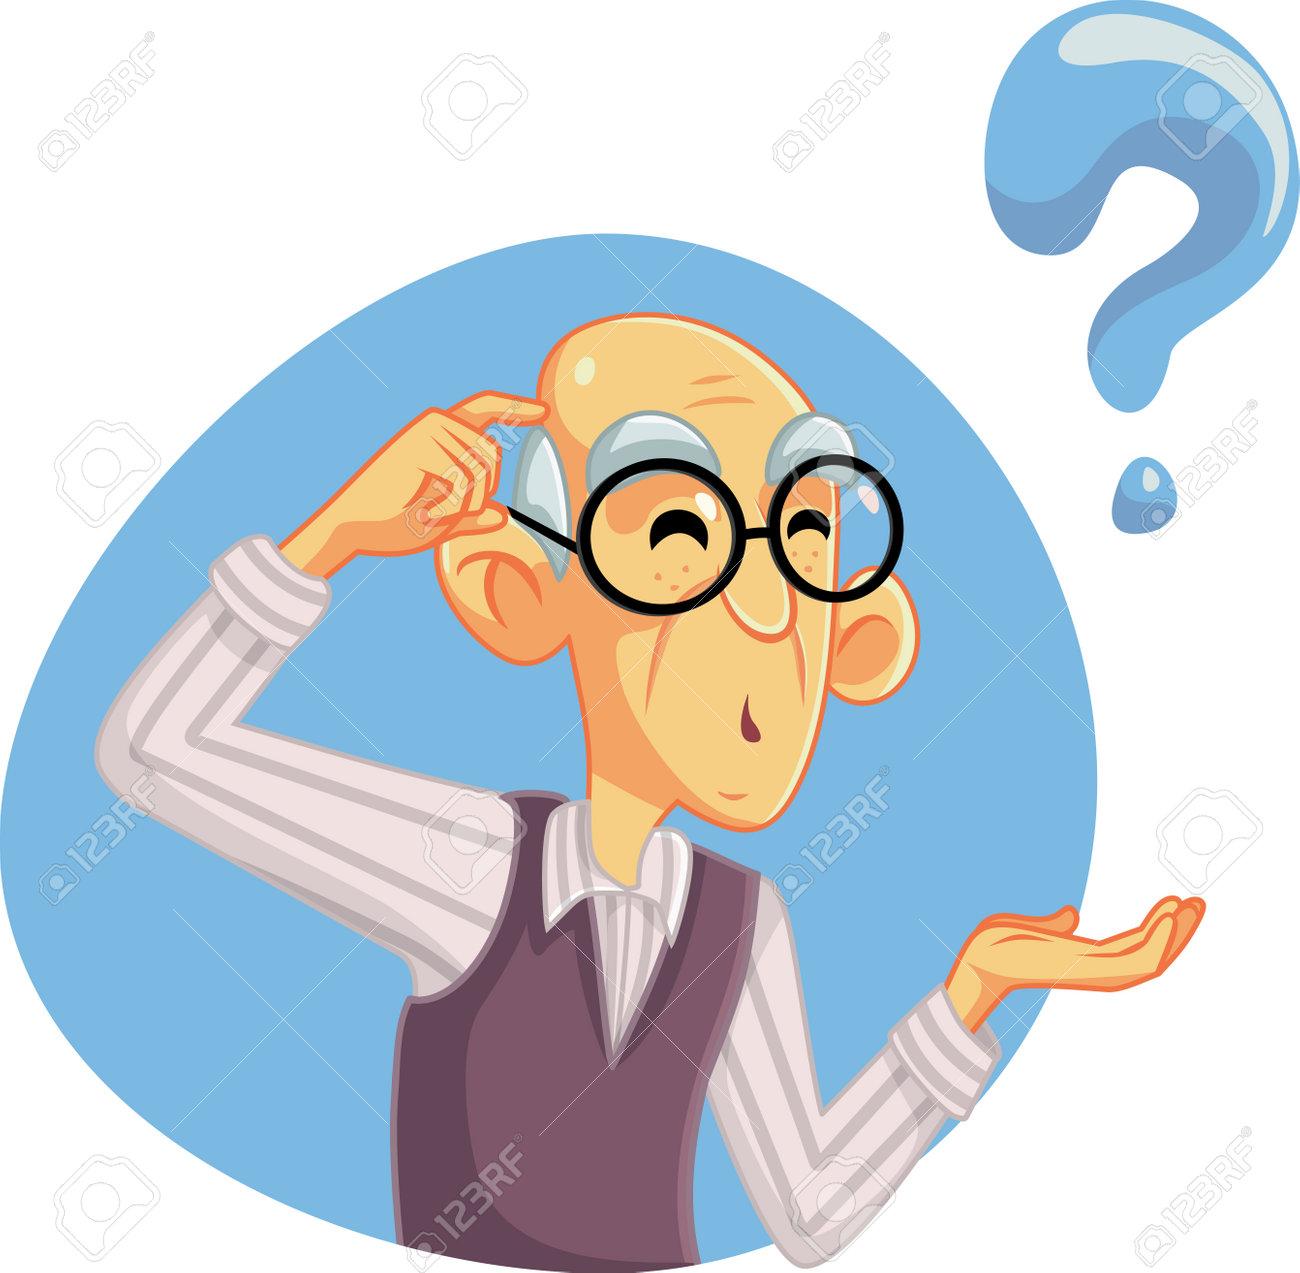 Senior Man Thinking Having Many Questions - 162562937